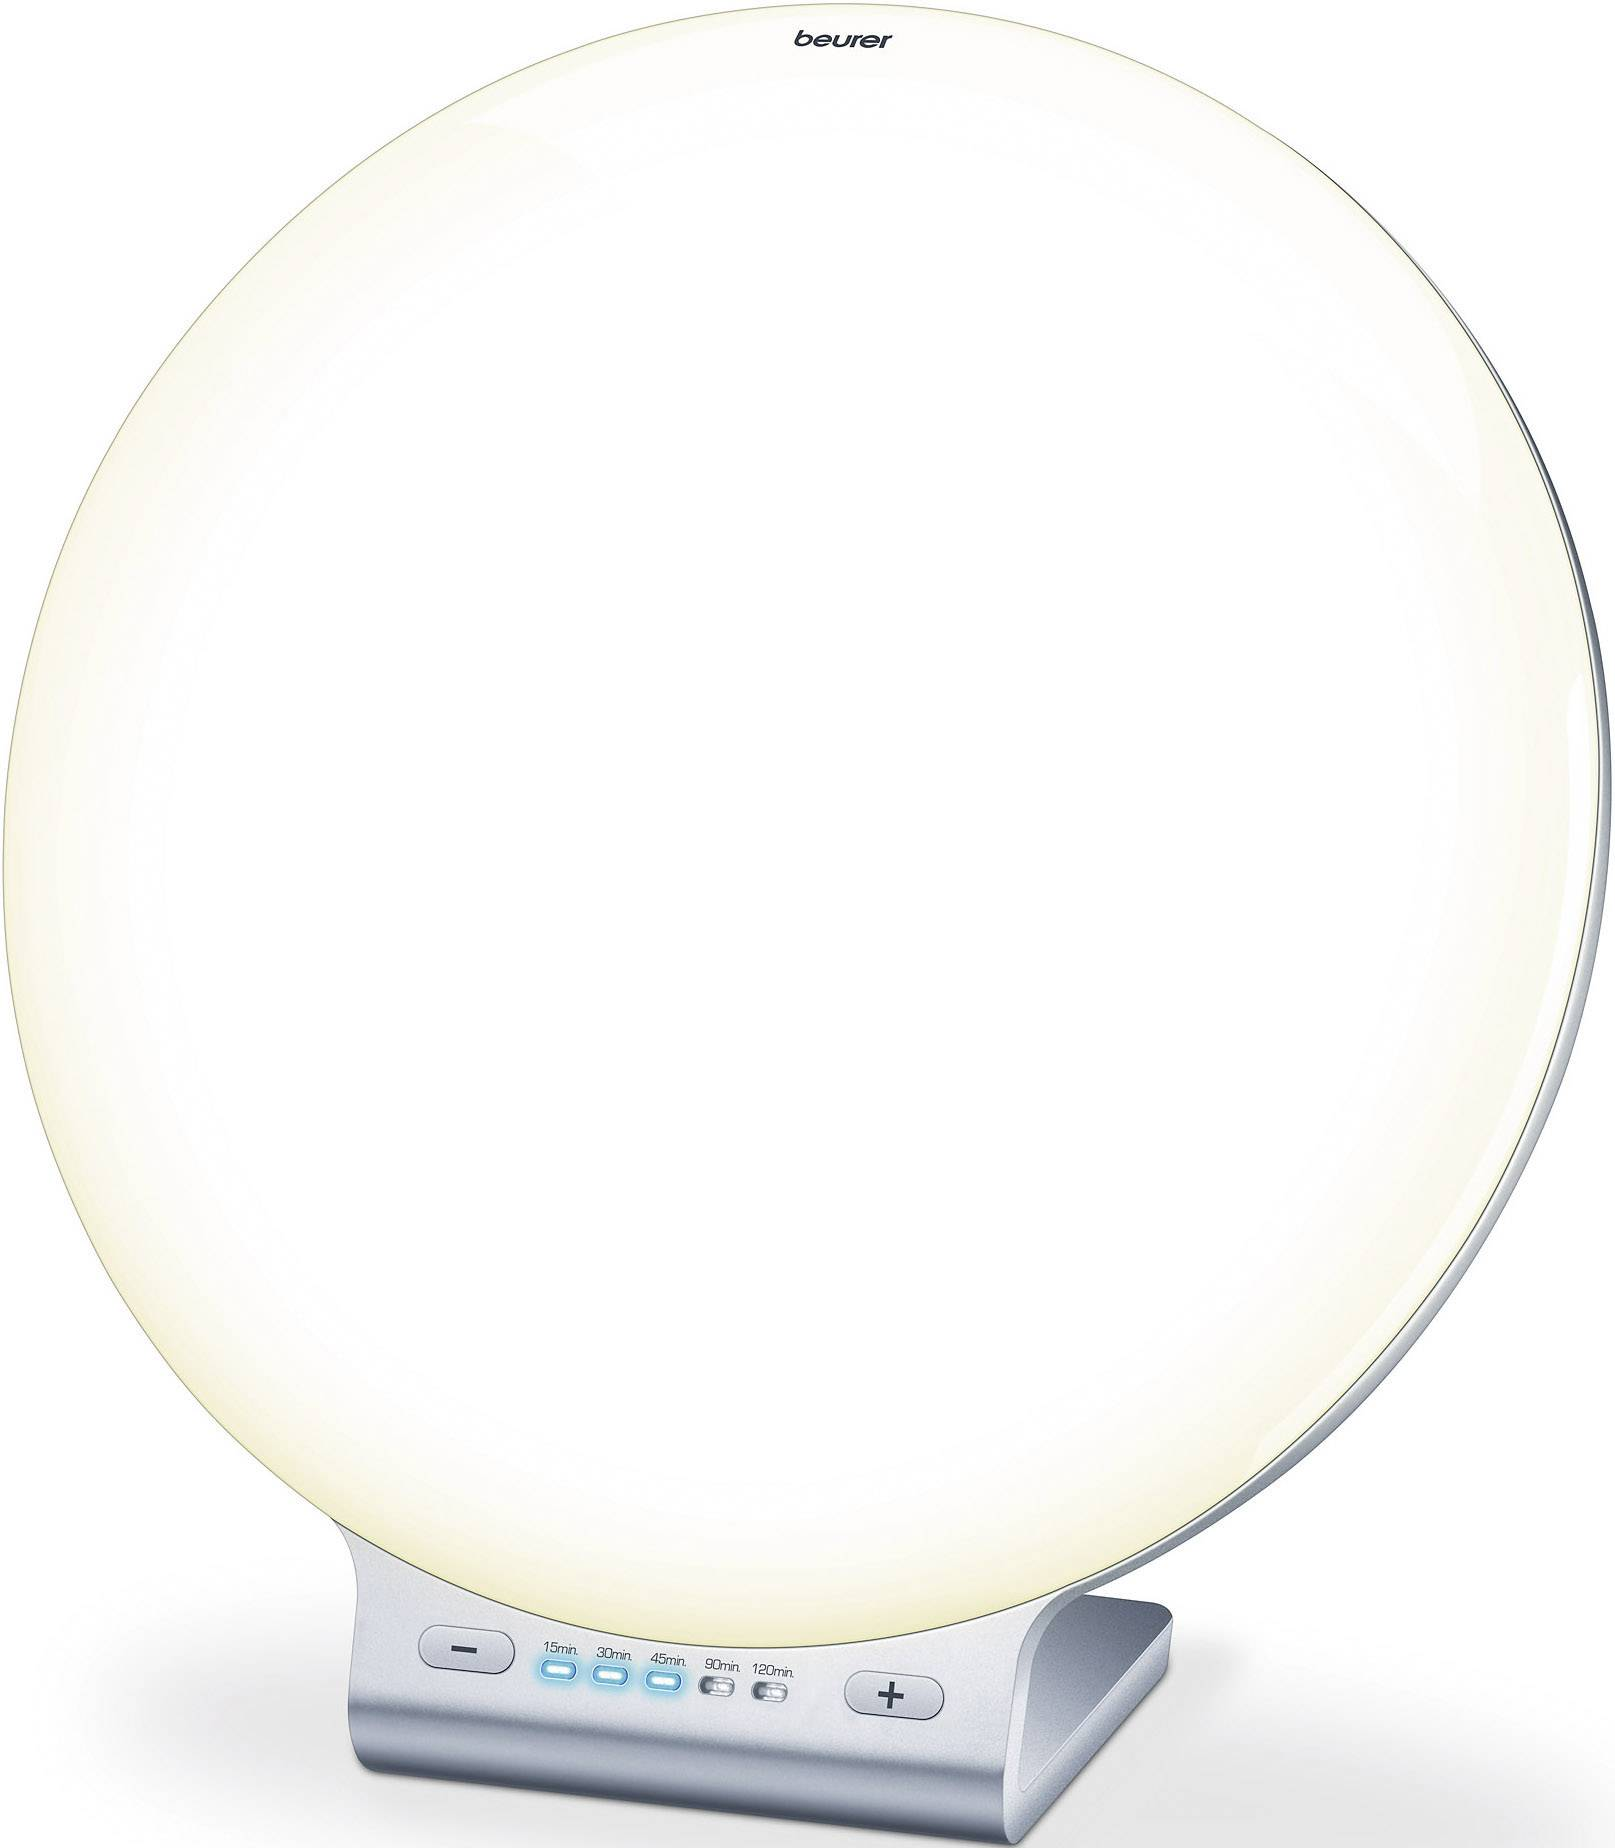 Lampa denného svetla Beurer TL 70, biela